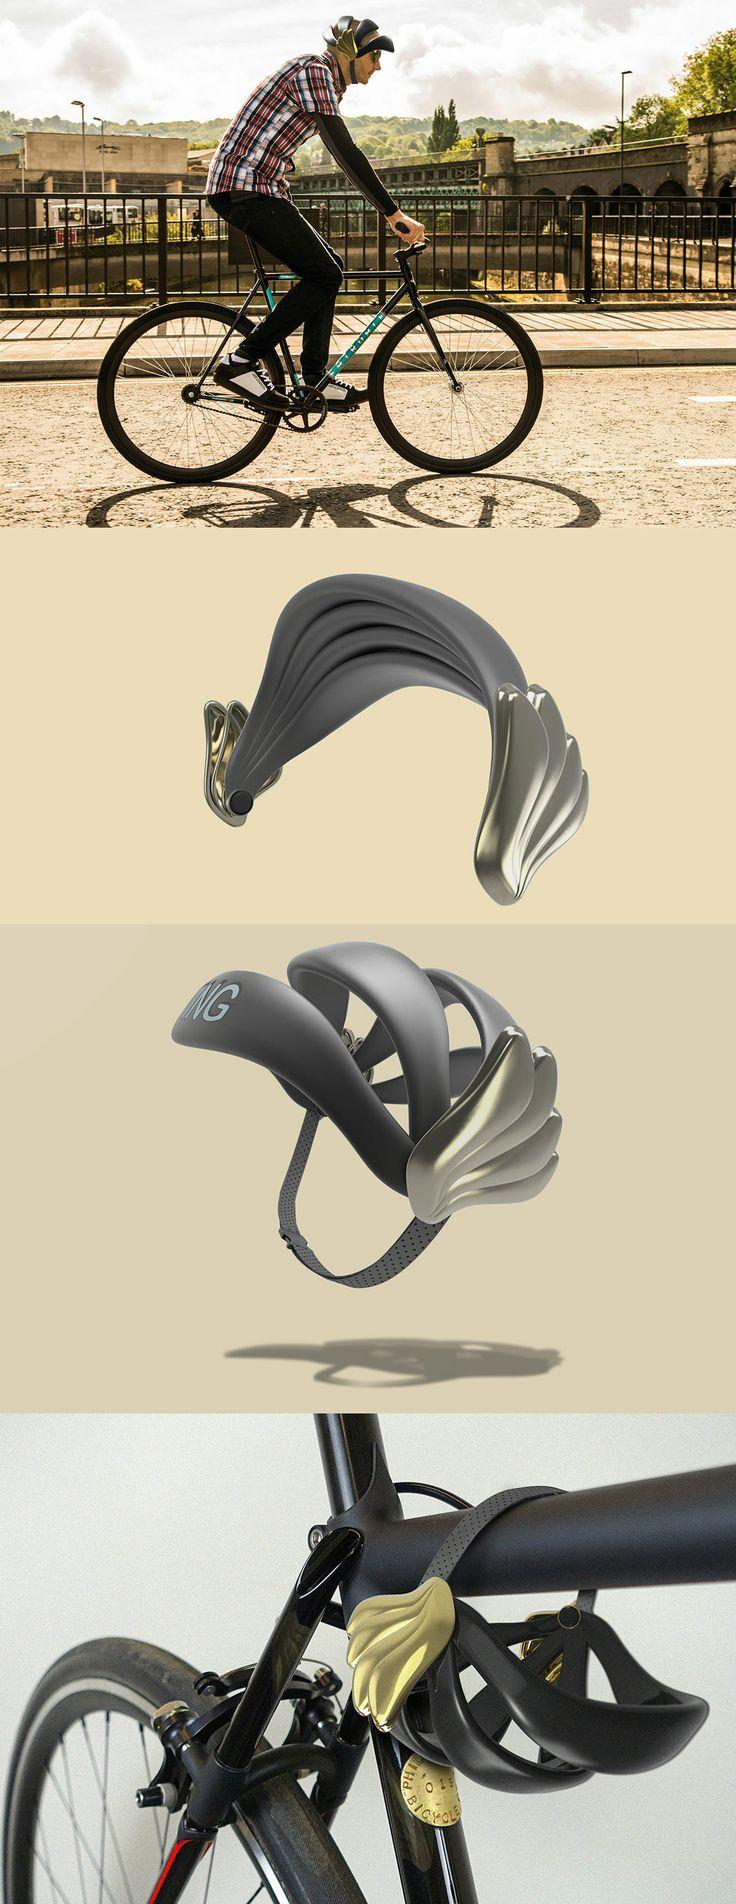 If Hermes Wore a Helmet. Read Full Story at Yanko Design